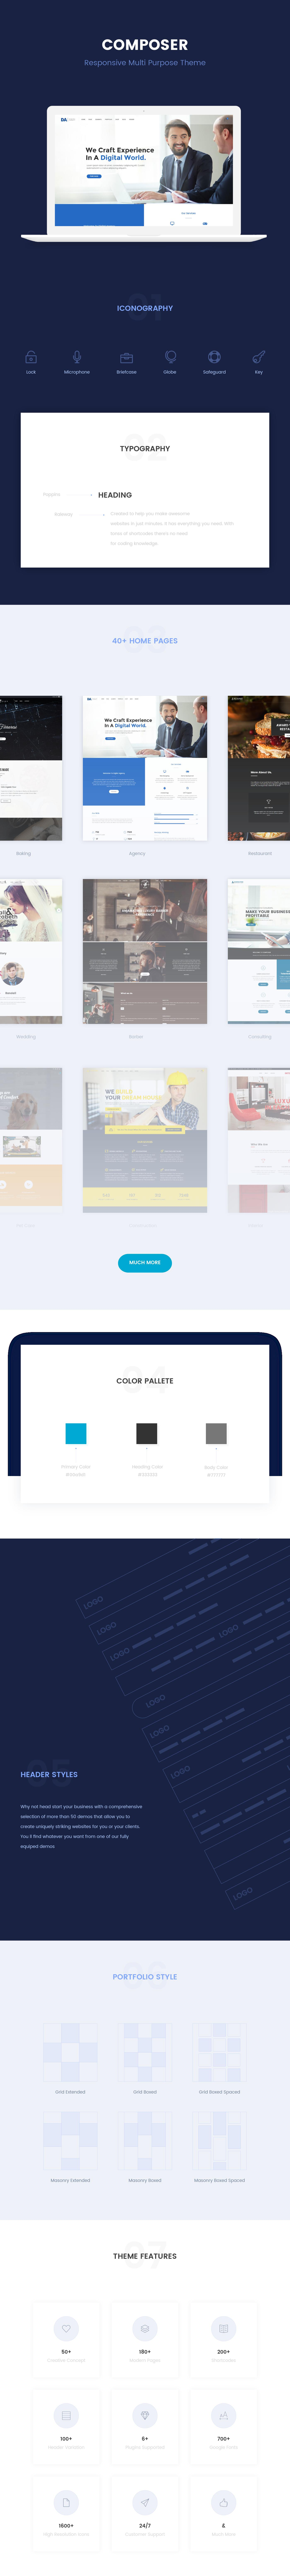 Blog business clean corporate creative mega menu modern Multi-purpose page builder